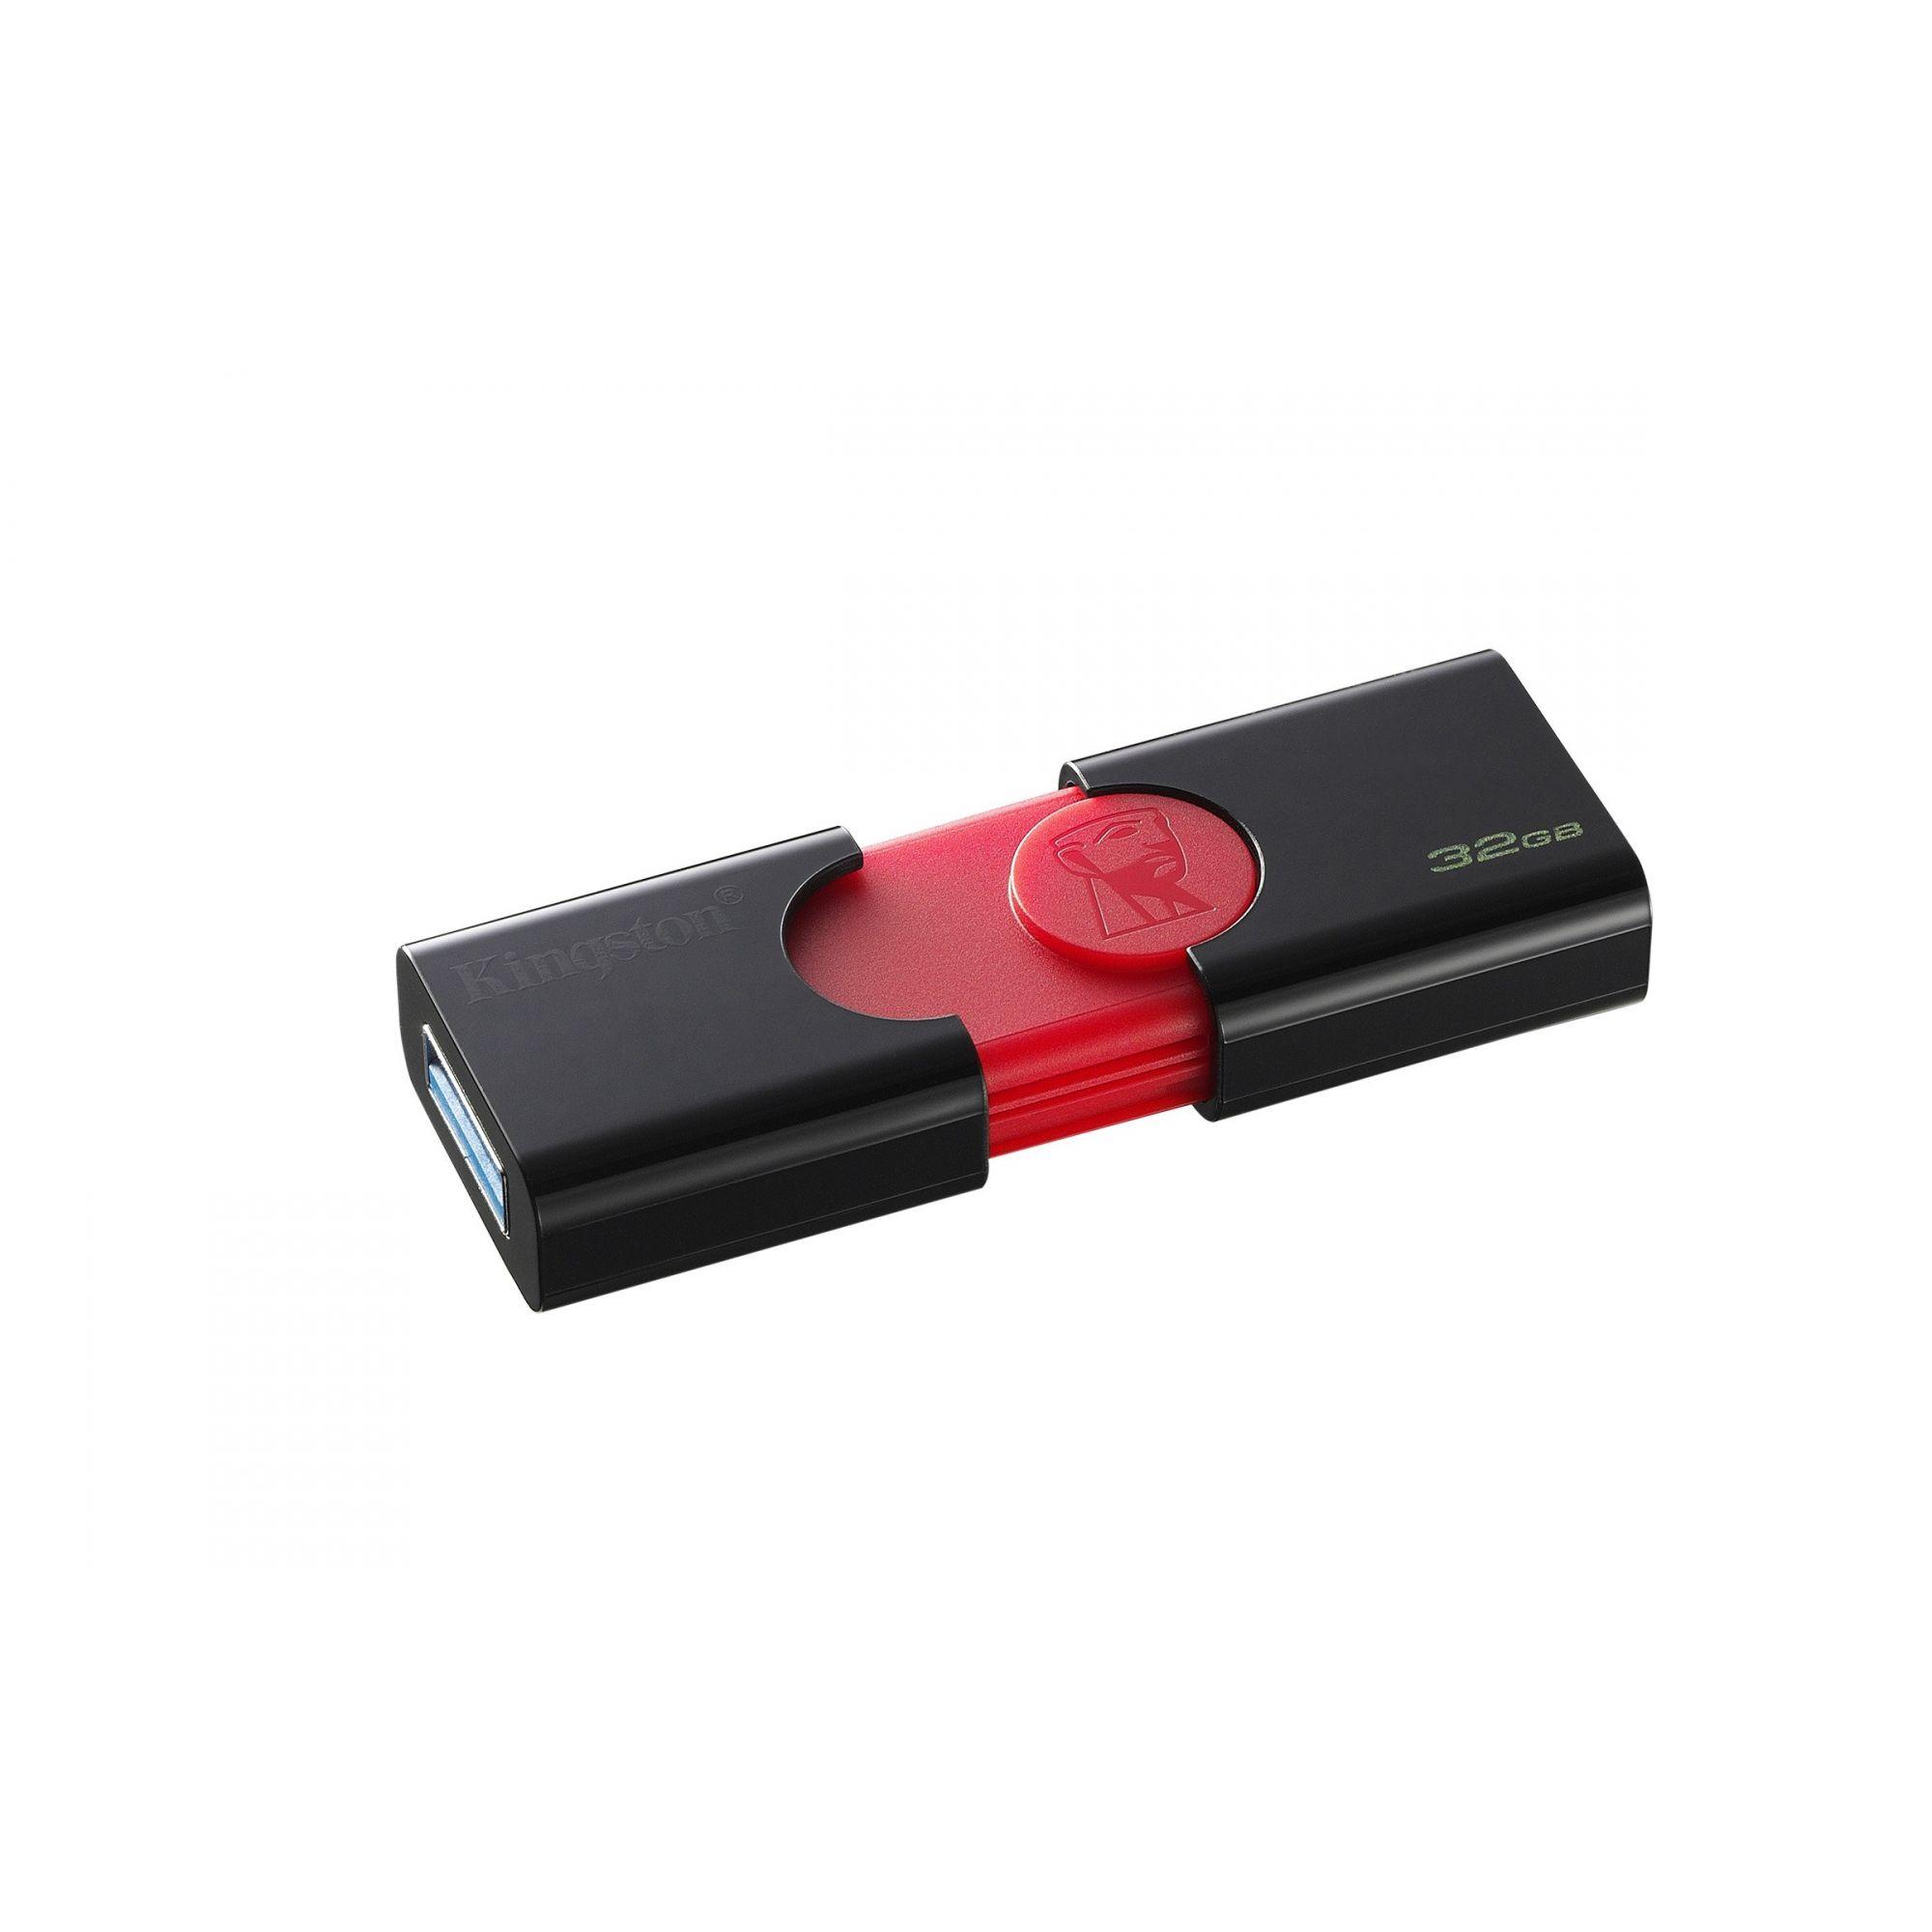 PEN DRIVE USB 3.0 DT106/32GB DATATRAVELER 106 32GB KINGSTON